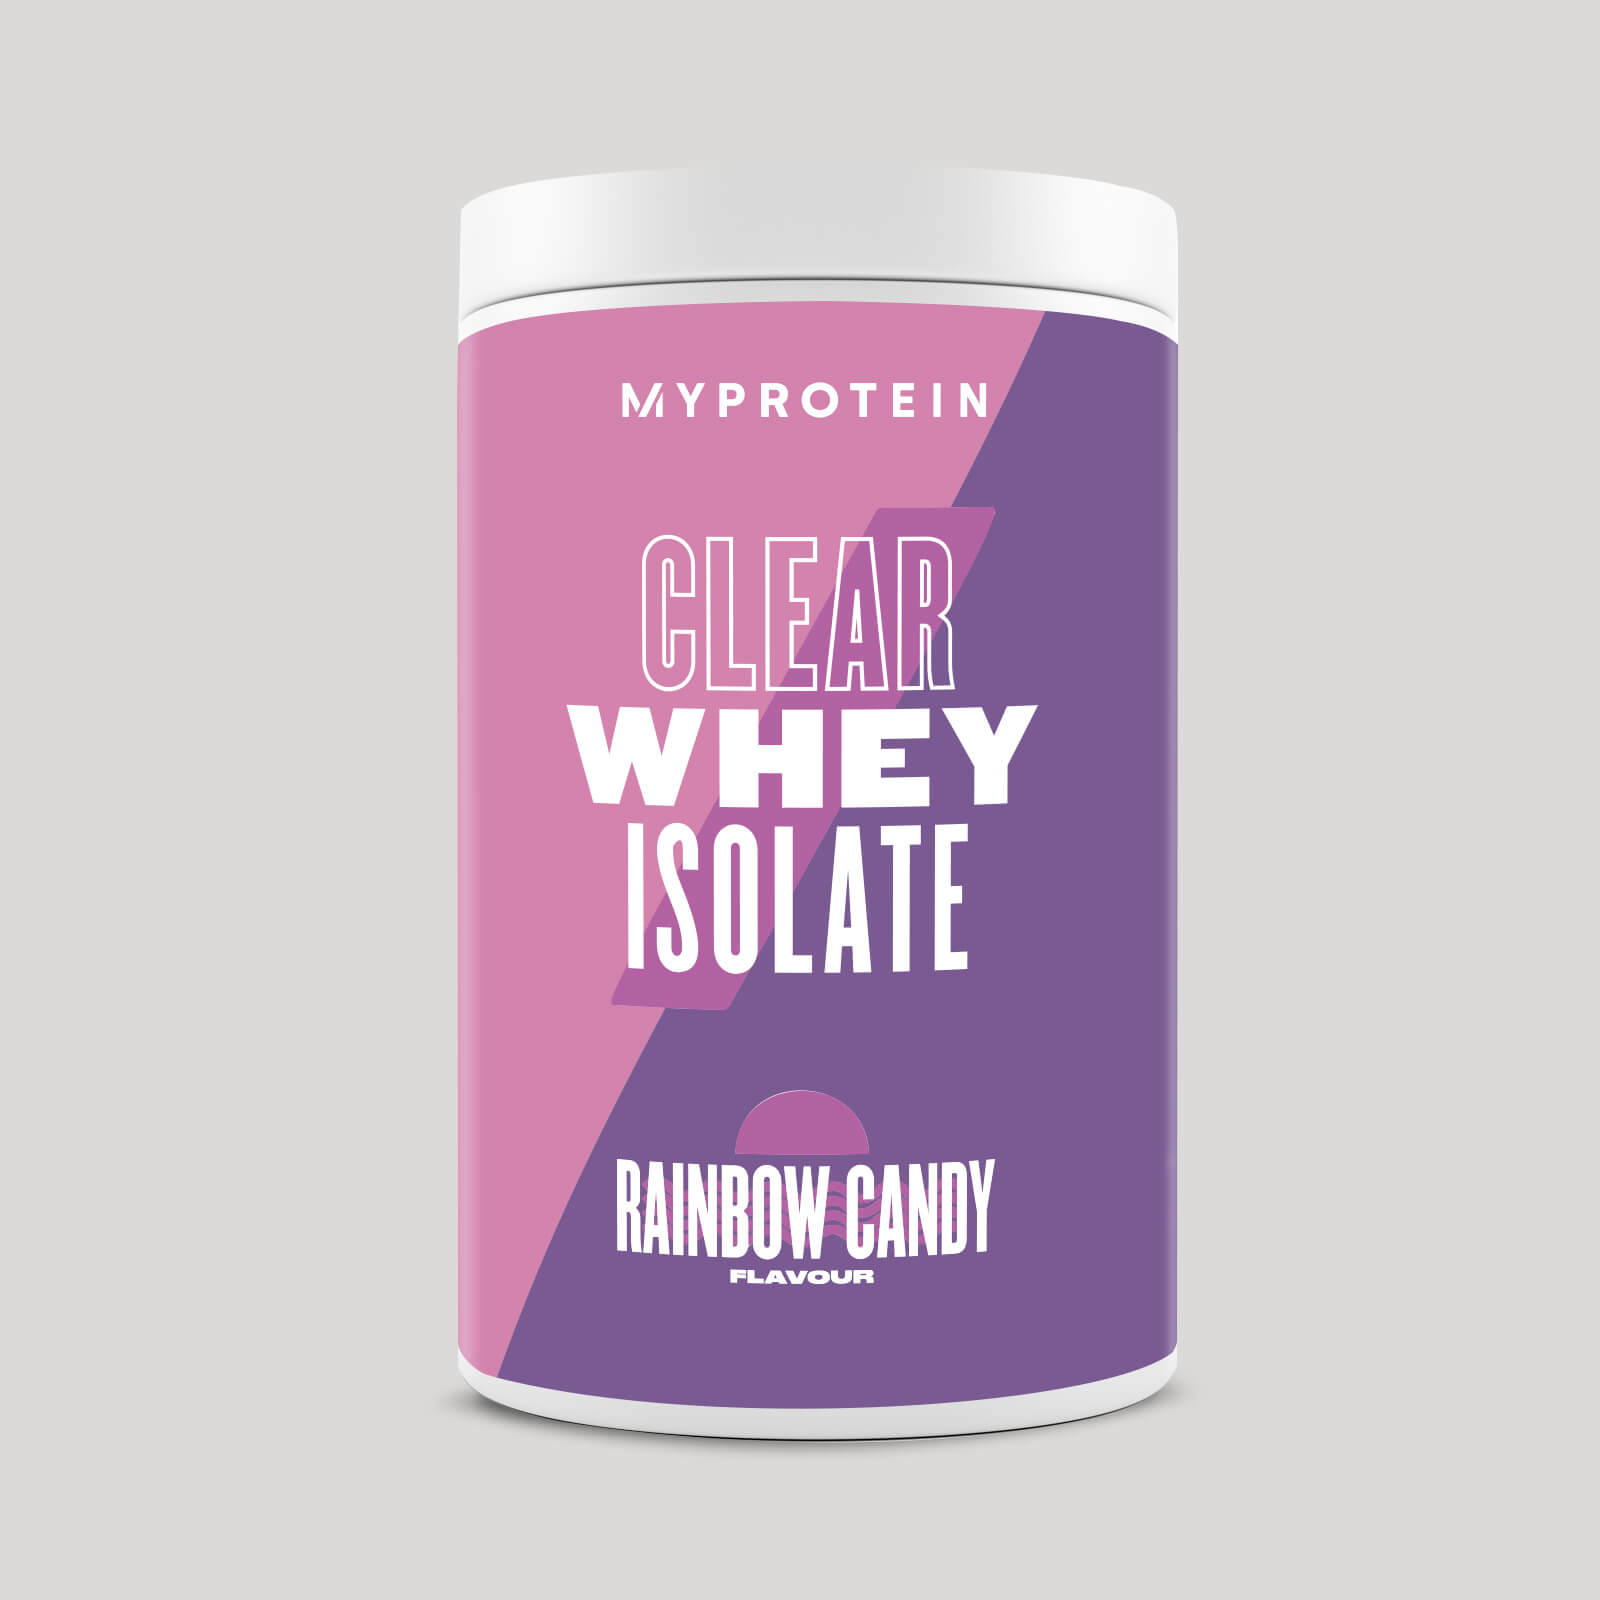 Myprotein Clear Whey Isolate Příchuť: Pomeranč/mango, Hmotnost: 500g